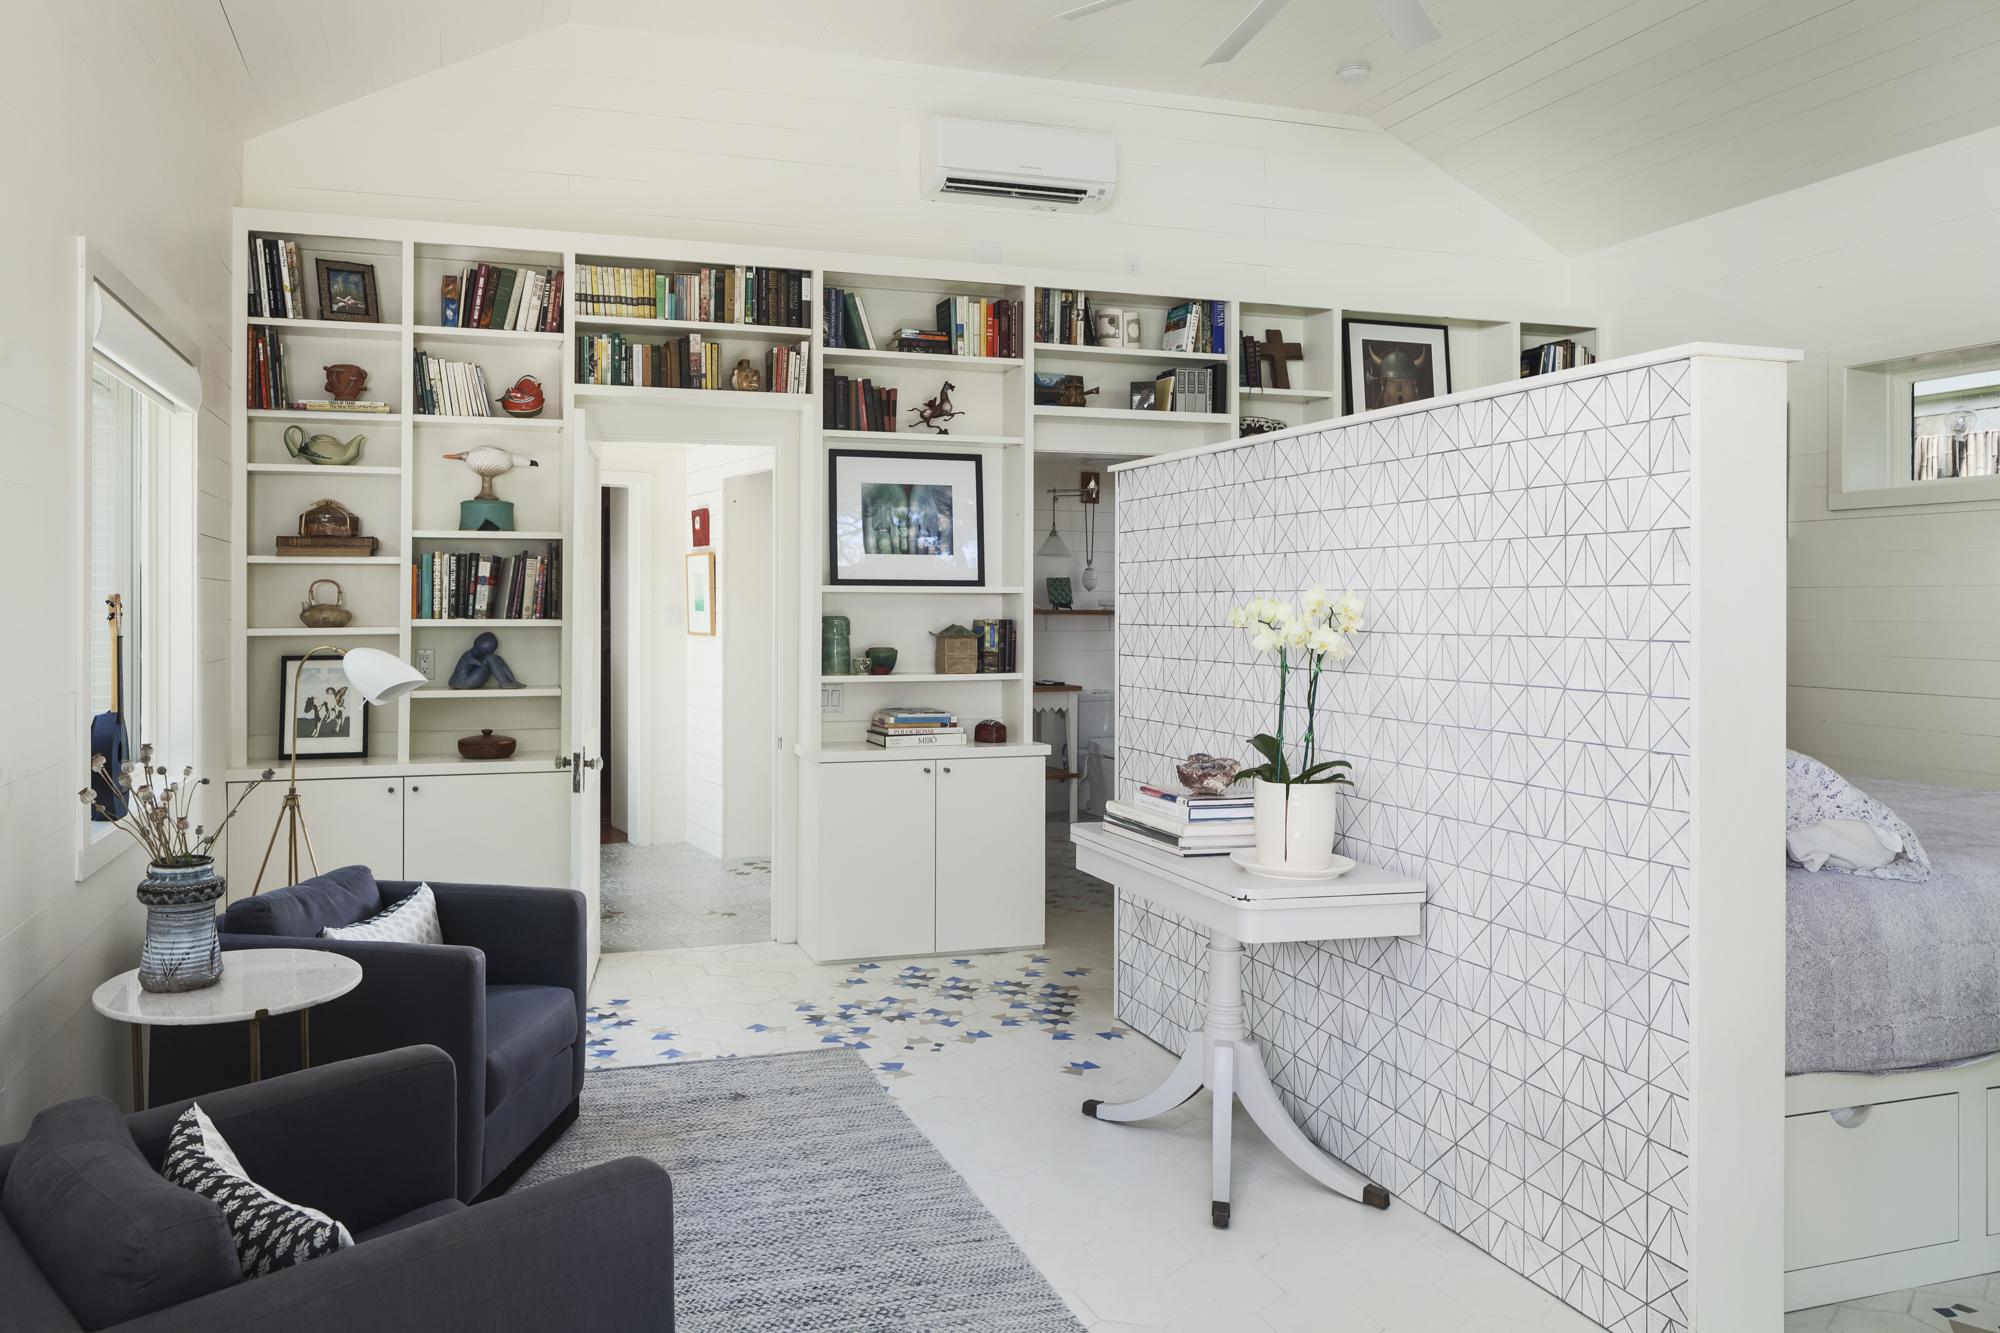 Elizabeth-Baird-Architecture-Annie Street-sitting room and bedroom.jpg